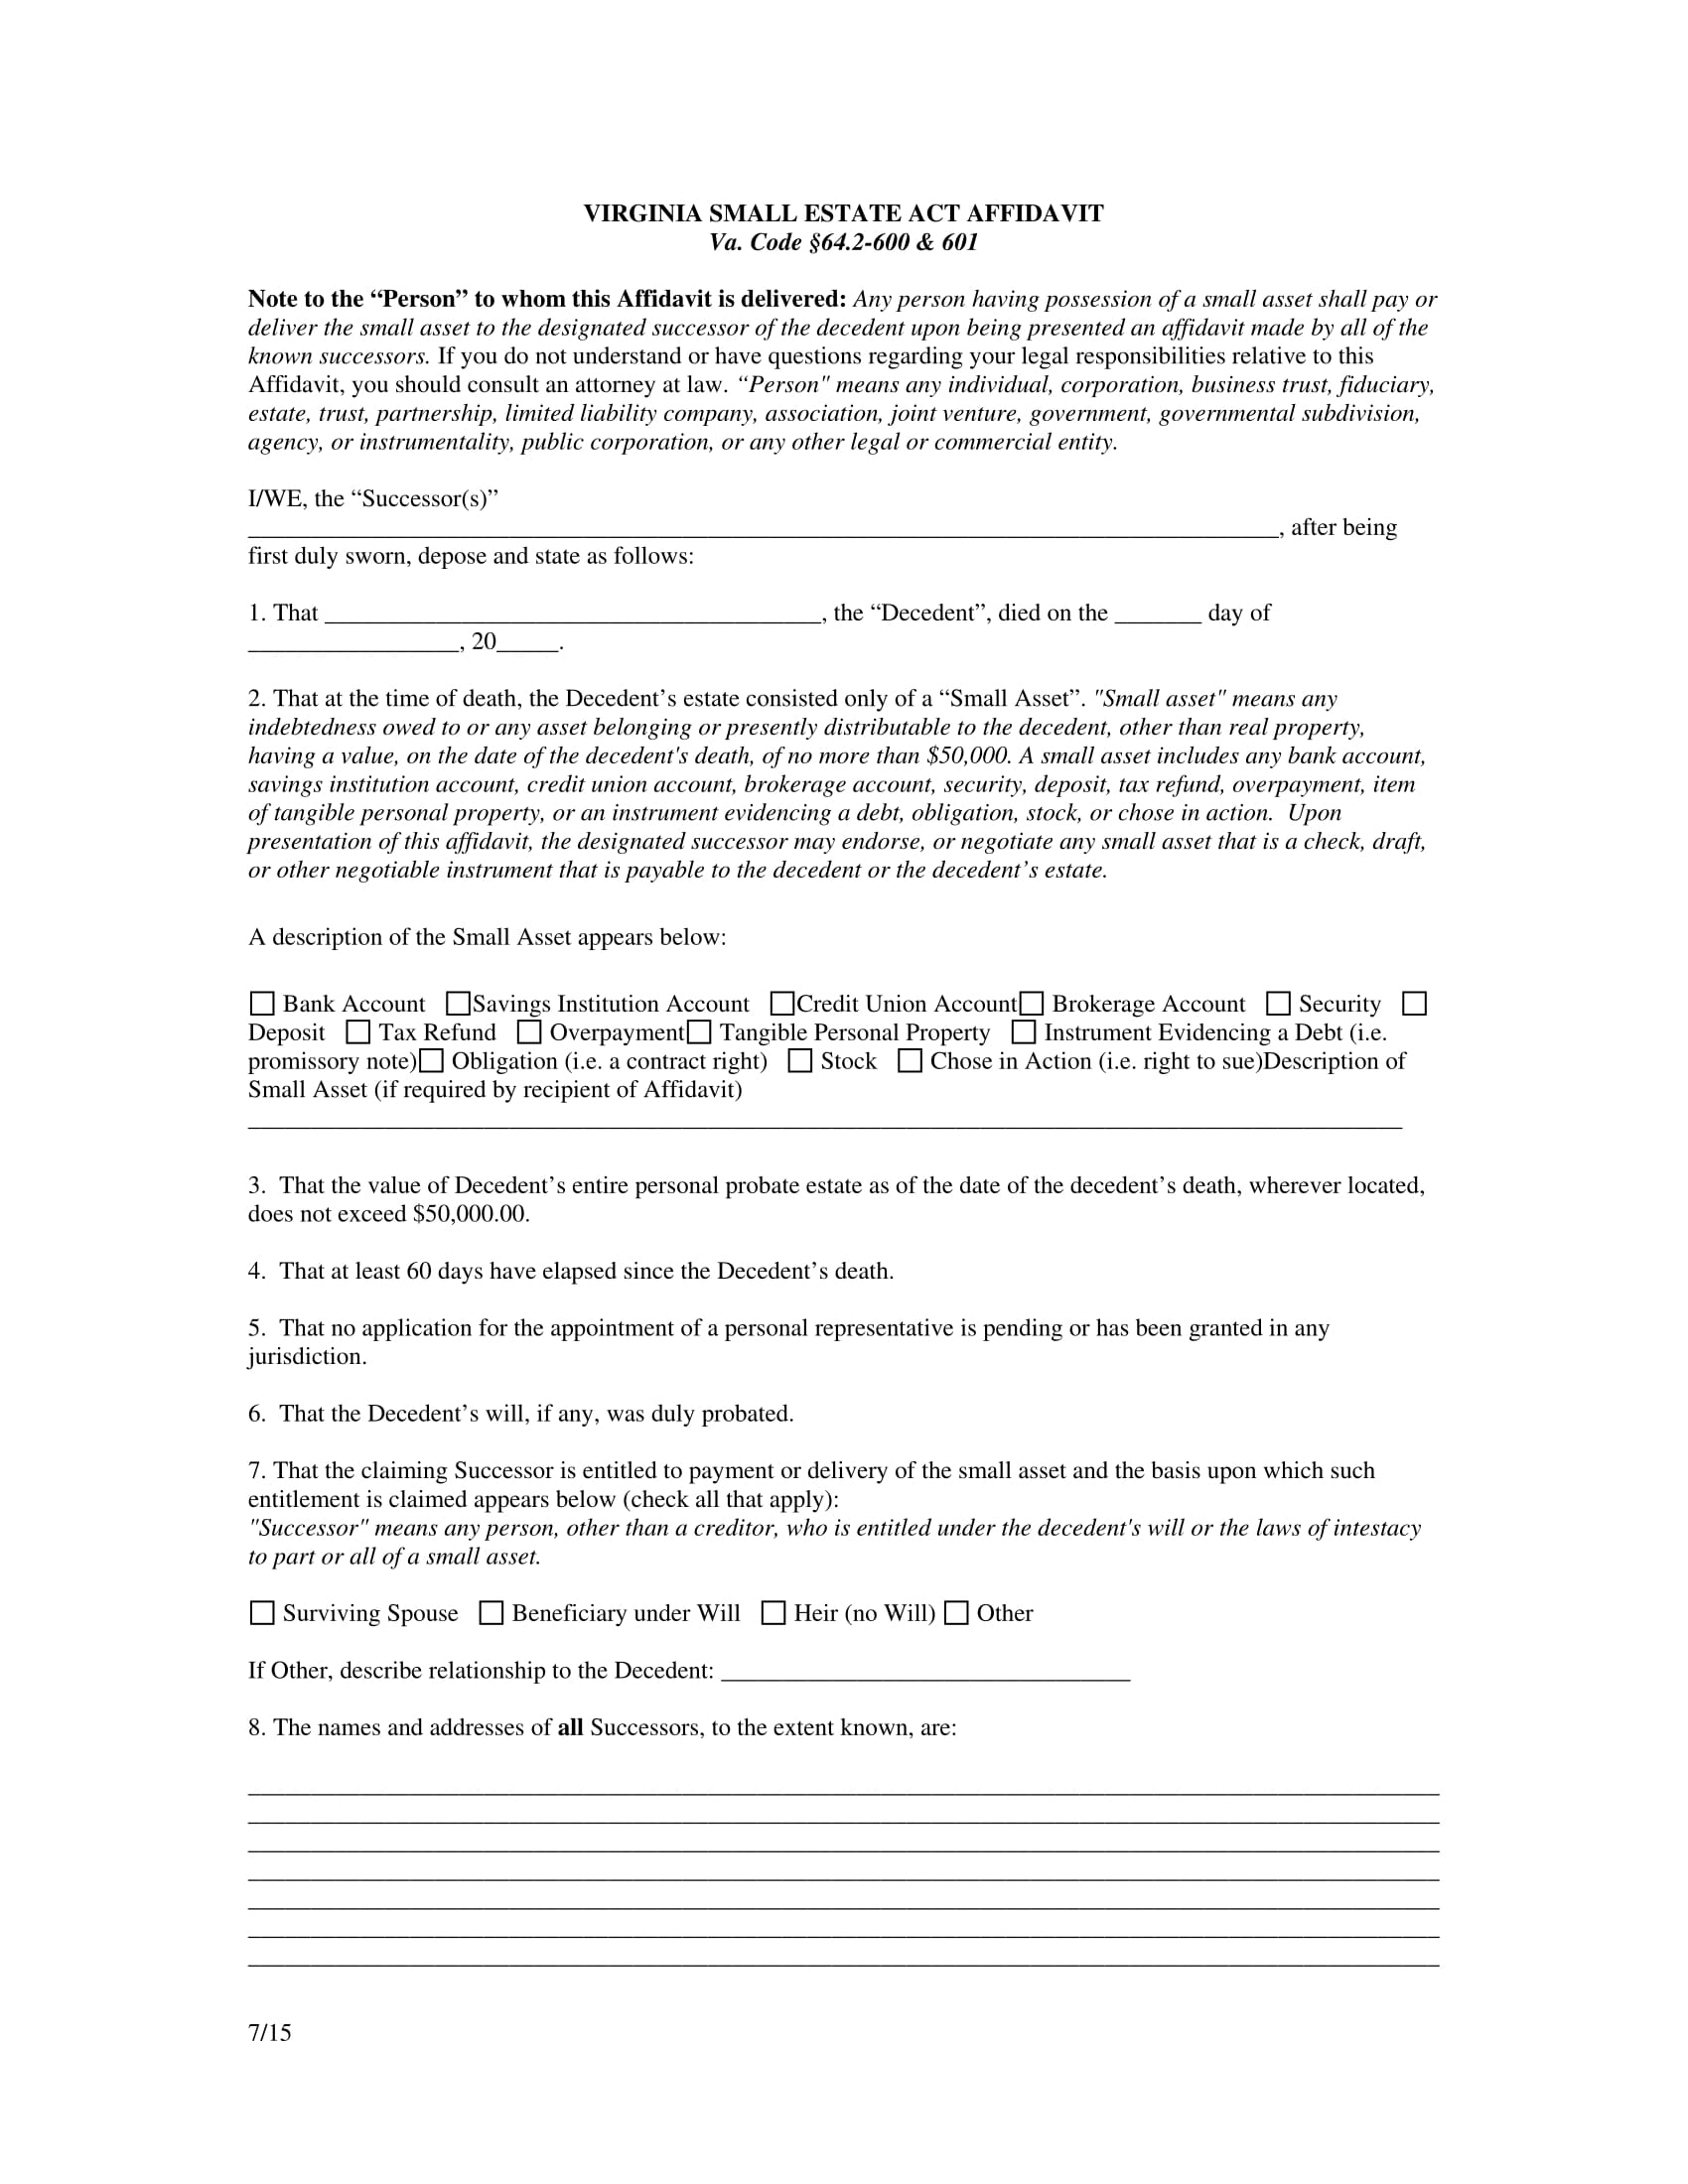 small estate act affidavit form 1